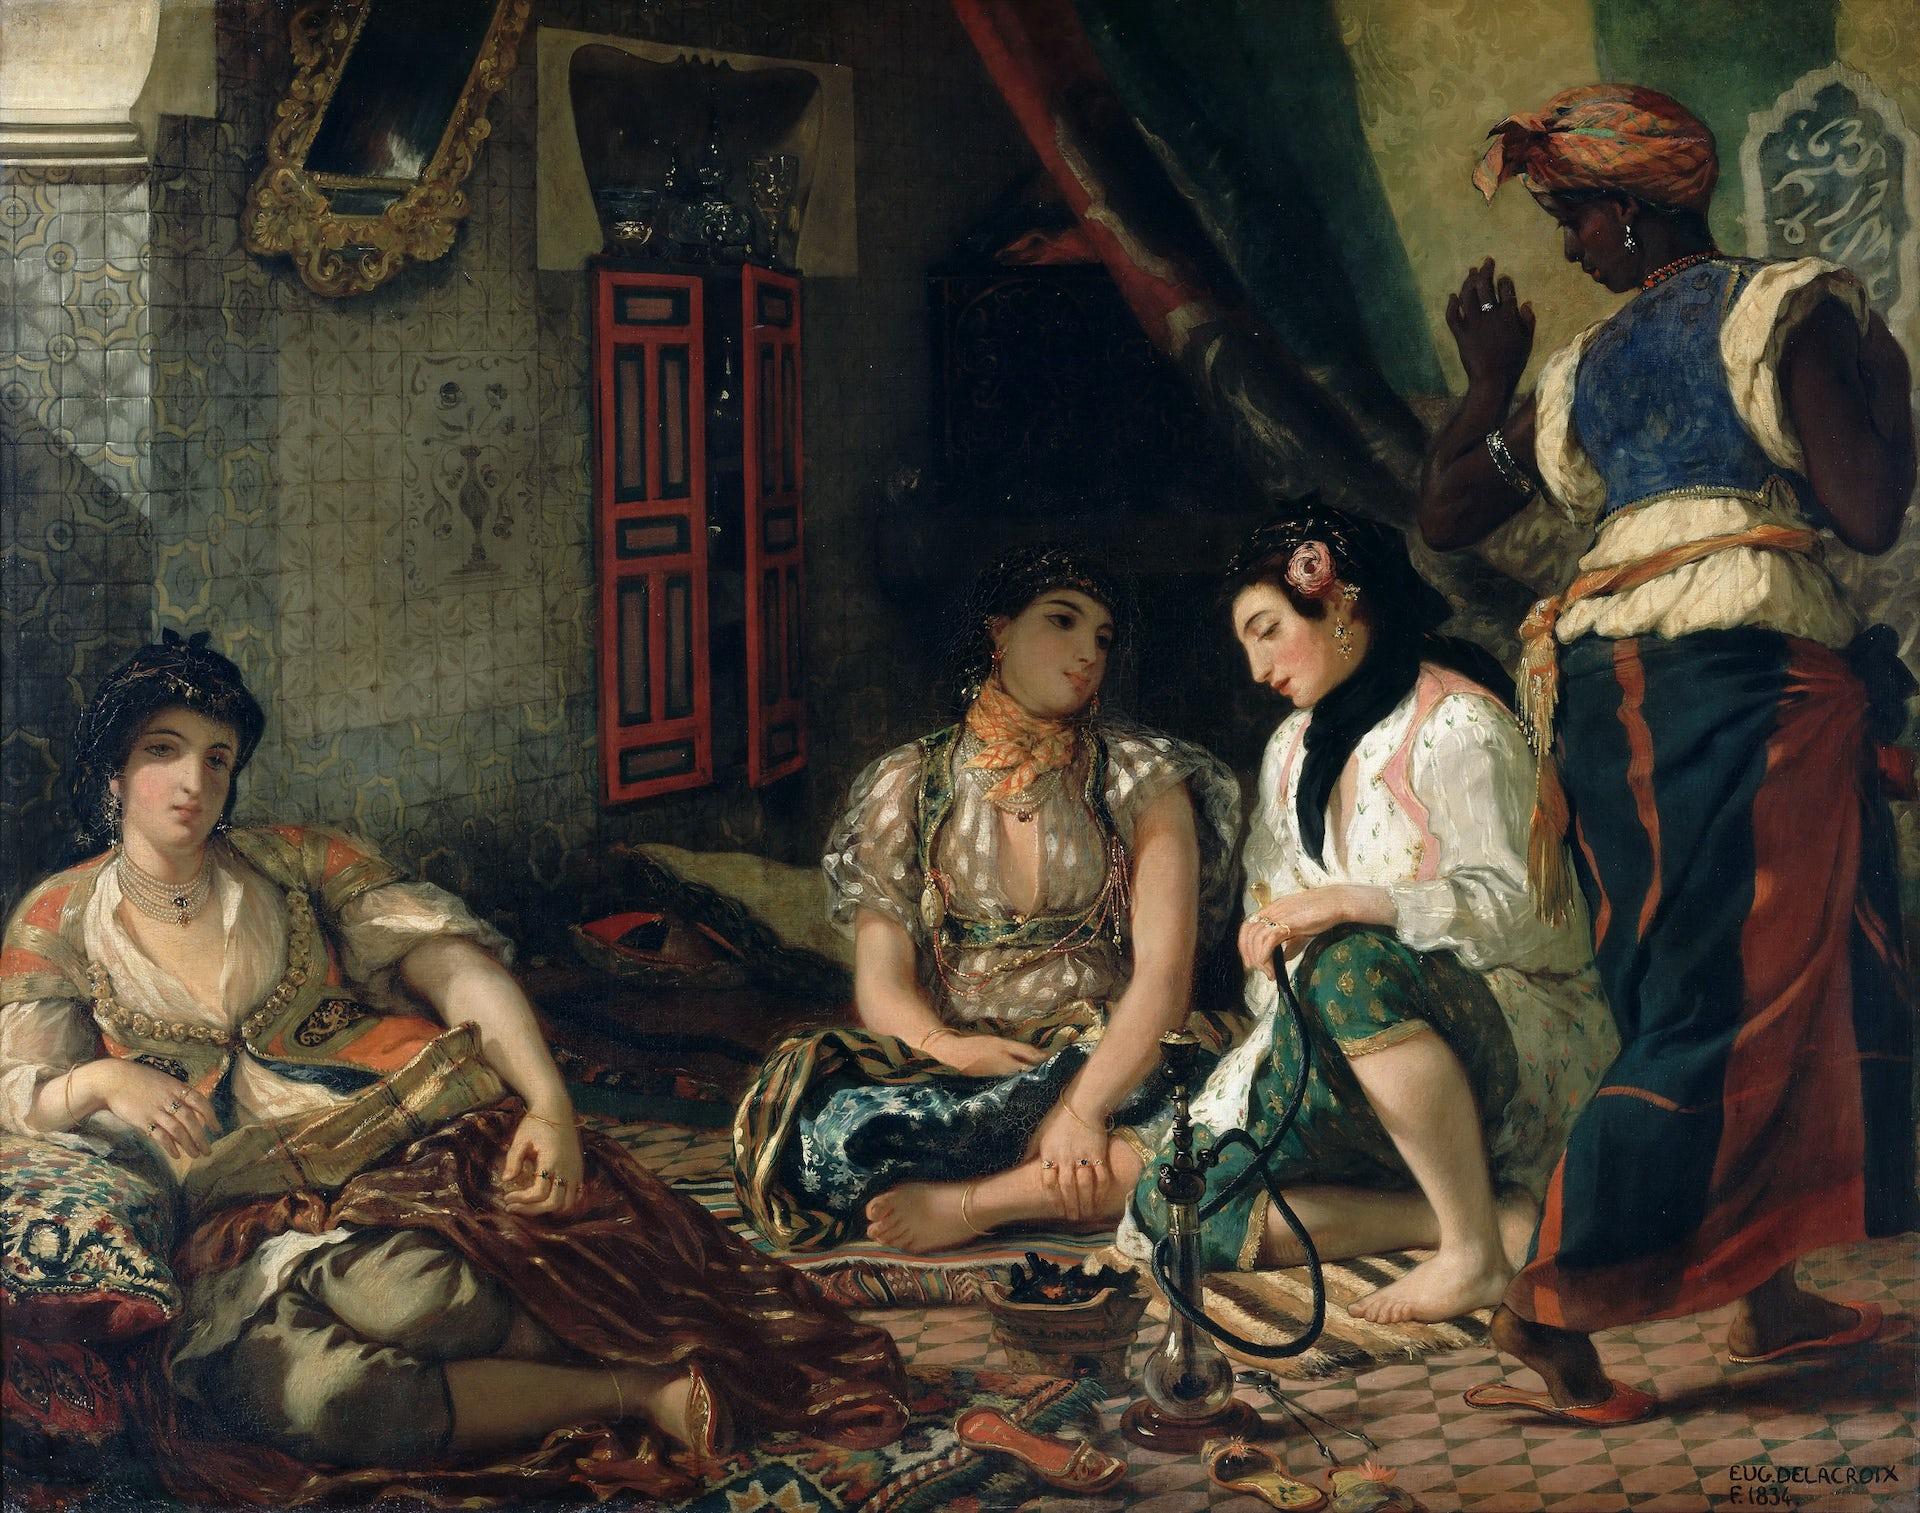 Delacroix at the Met: A retrospective that evokes today's turmoil